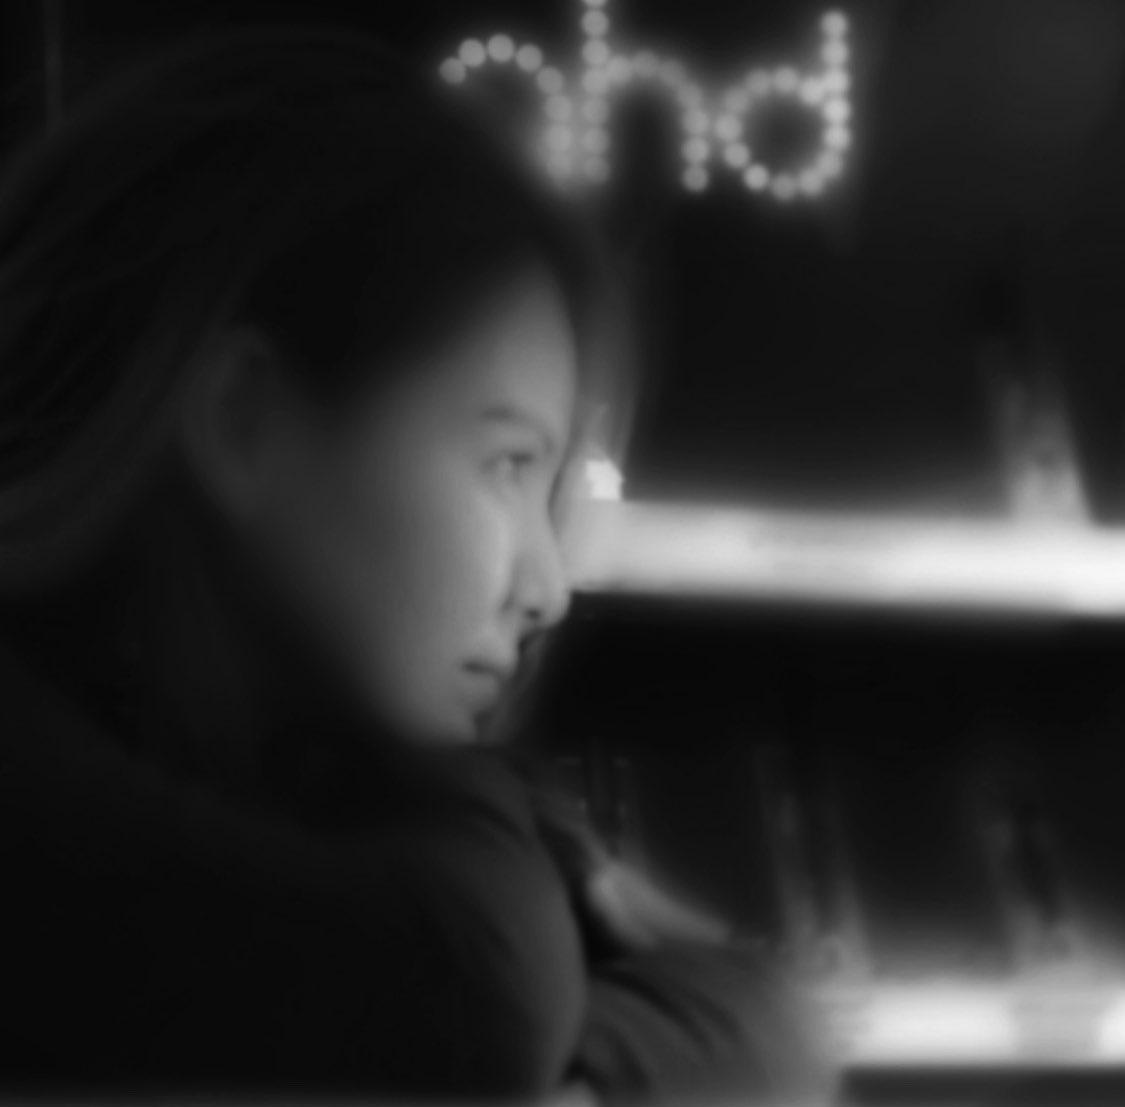 fantasticare.  #foto #fotografia #arte #photography #photo #picture #photographe #camera #shot #artday #igrecommend #moments #lensculture #artofvisuals #nikon #camera #artwork #artofinstagram #arts #design #designinspiration #designboom #designlovers #光 #アートワーク #フォトpic.twitter.com/xxjpAoXILT